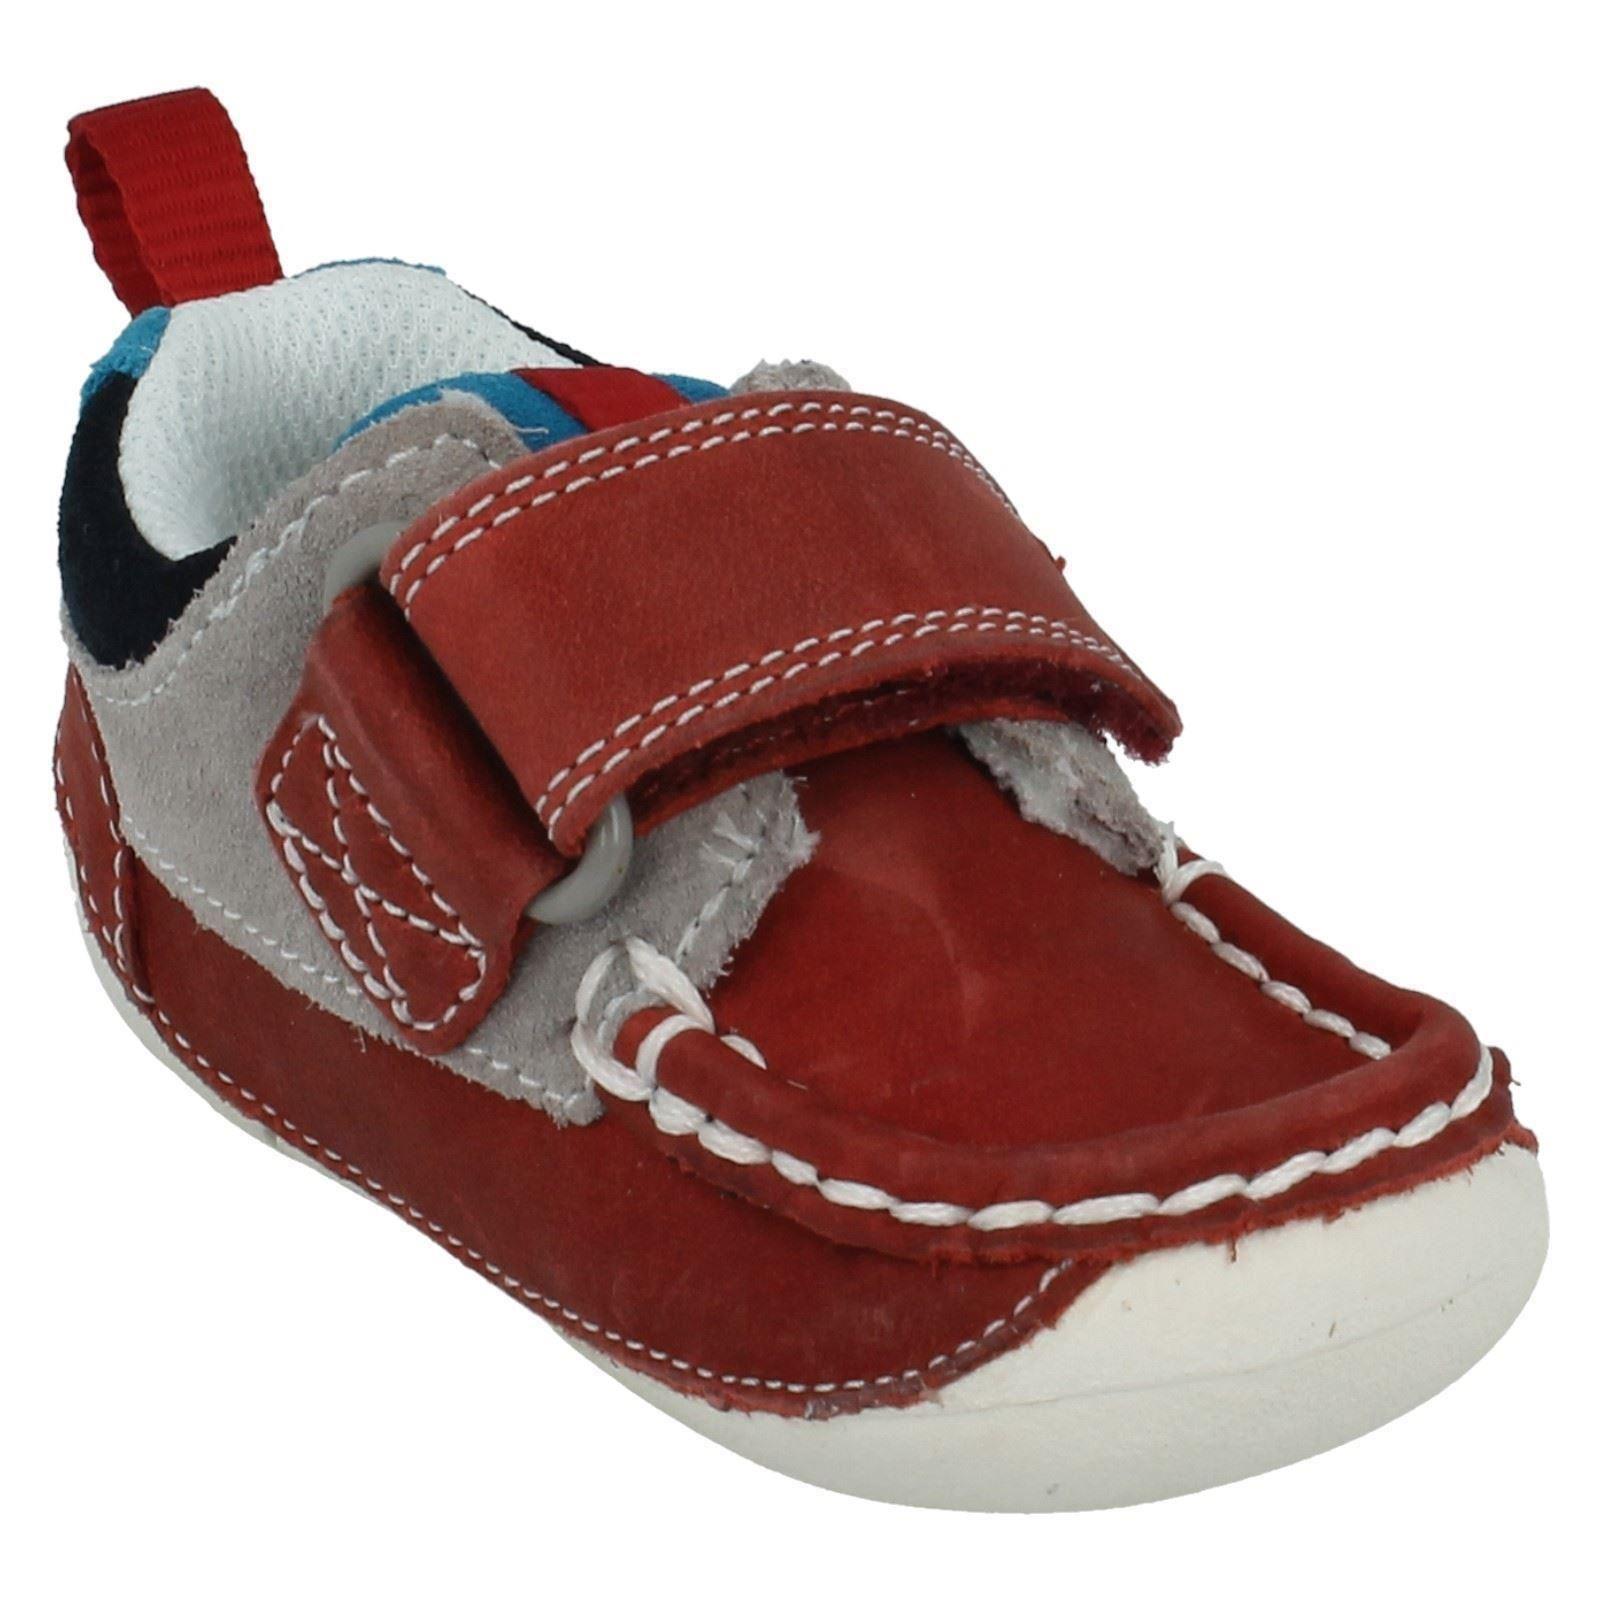 Boys Clarks First Shoes Cruiser Deck